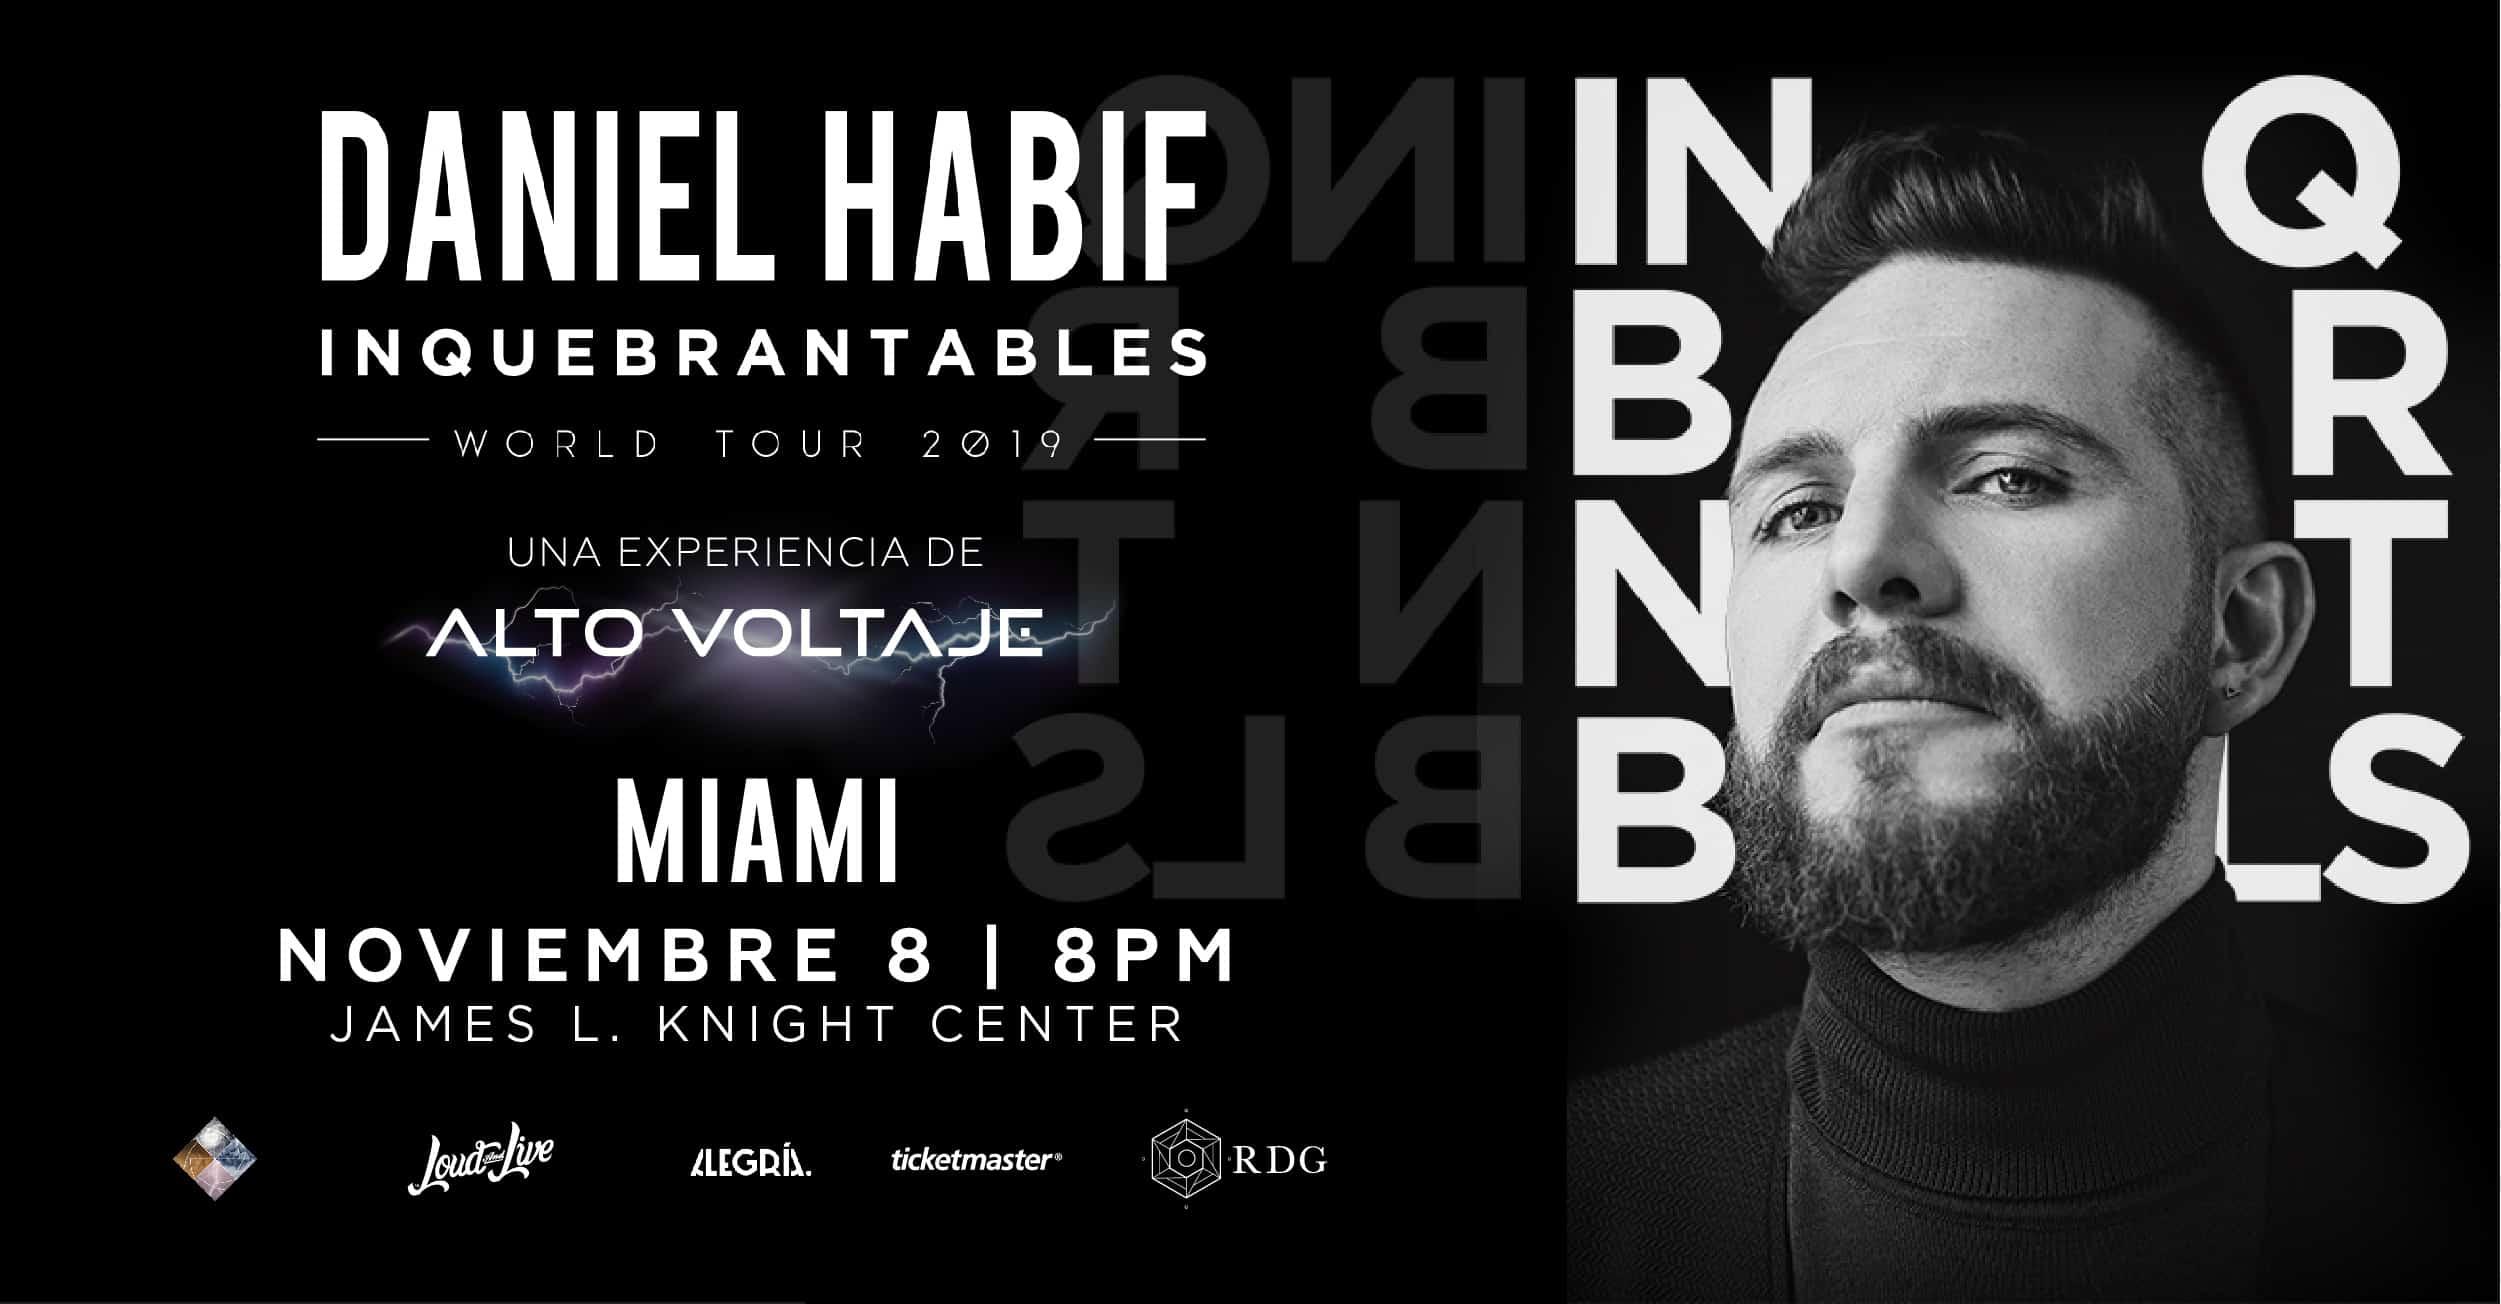 POSTER ALTOVOLT Miami Cover - Daniel Habif: Inquebrantables World Tour 2019